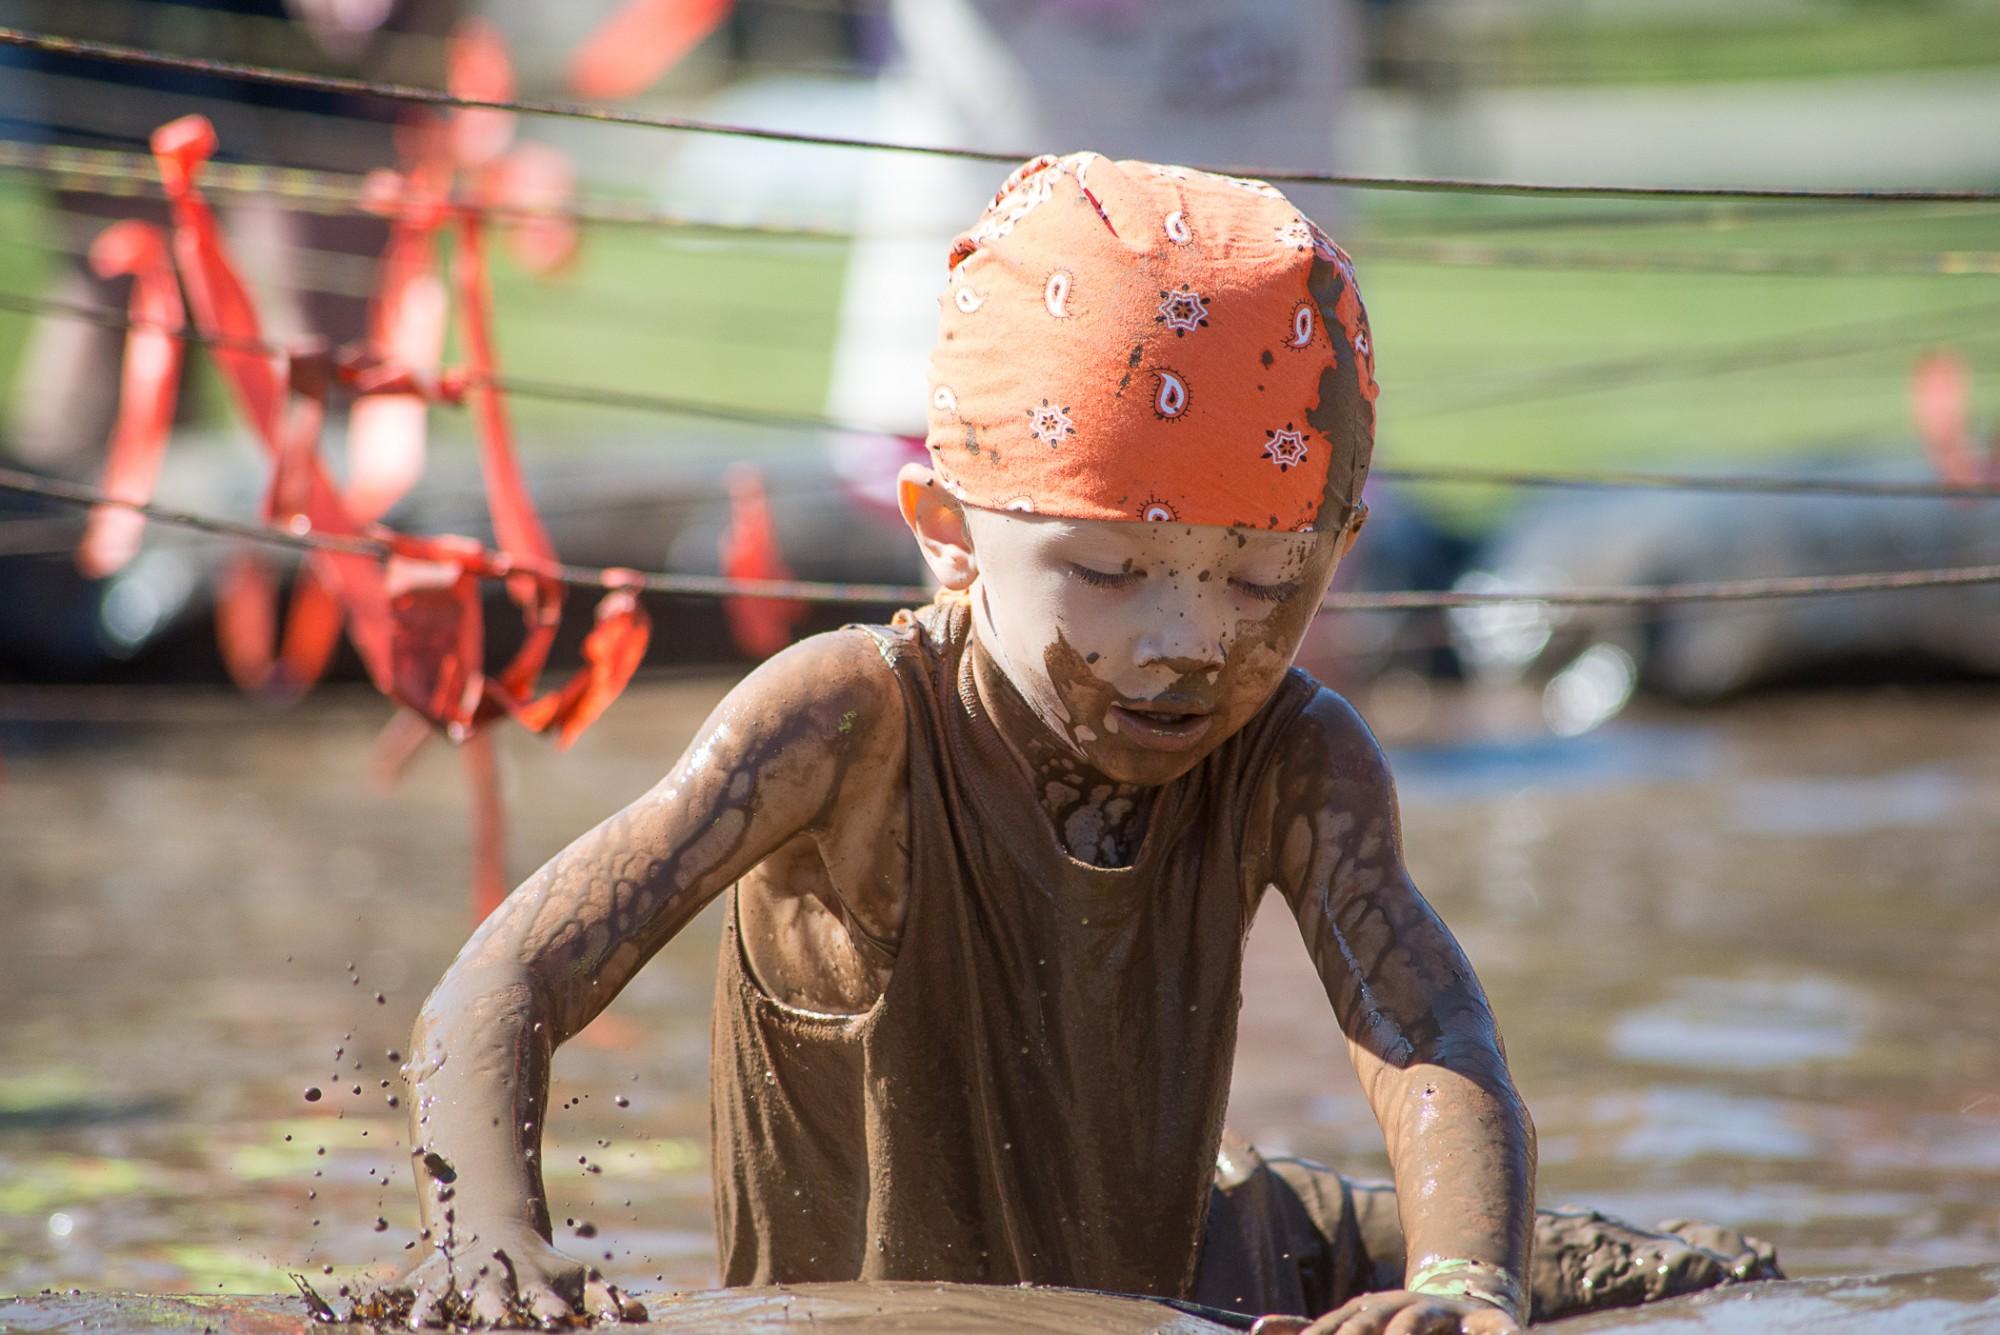 City of neenah fun. Mud clipart filthy